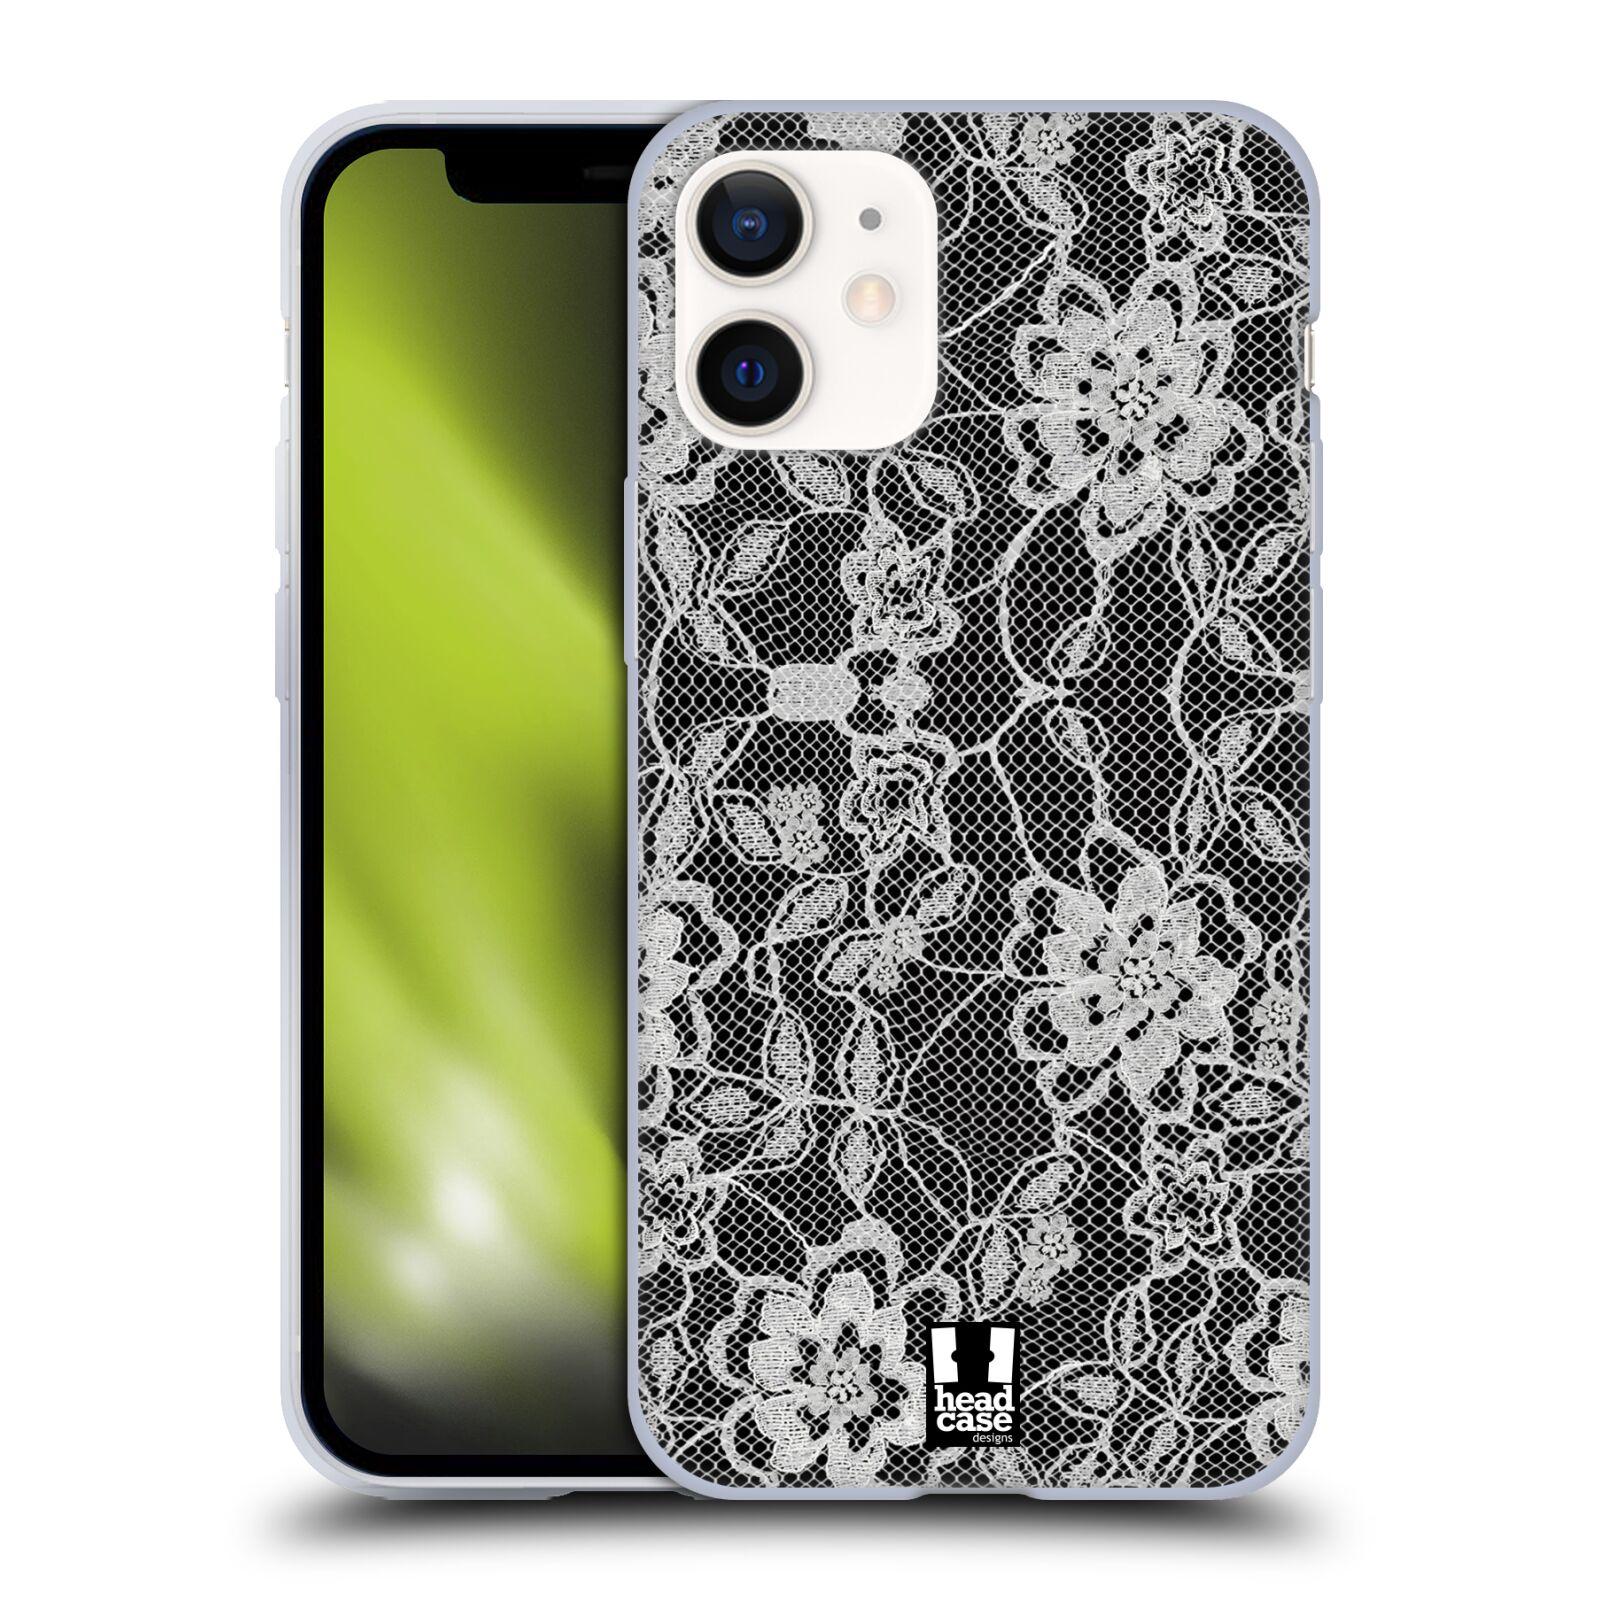 Silikonové pouzdro na mobil Apple iPhone 12 Mini - Head Case - FLOWERY KRAJKA